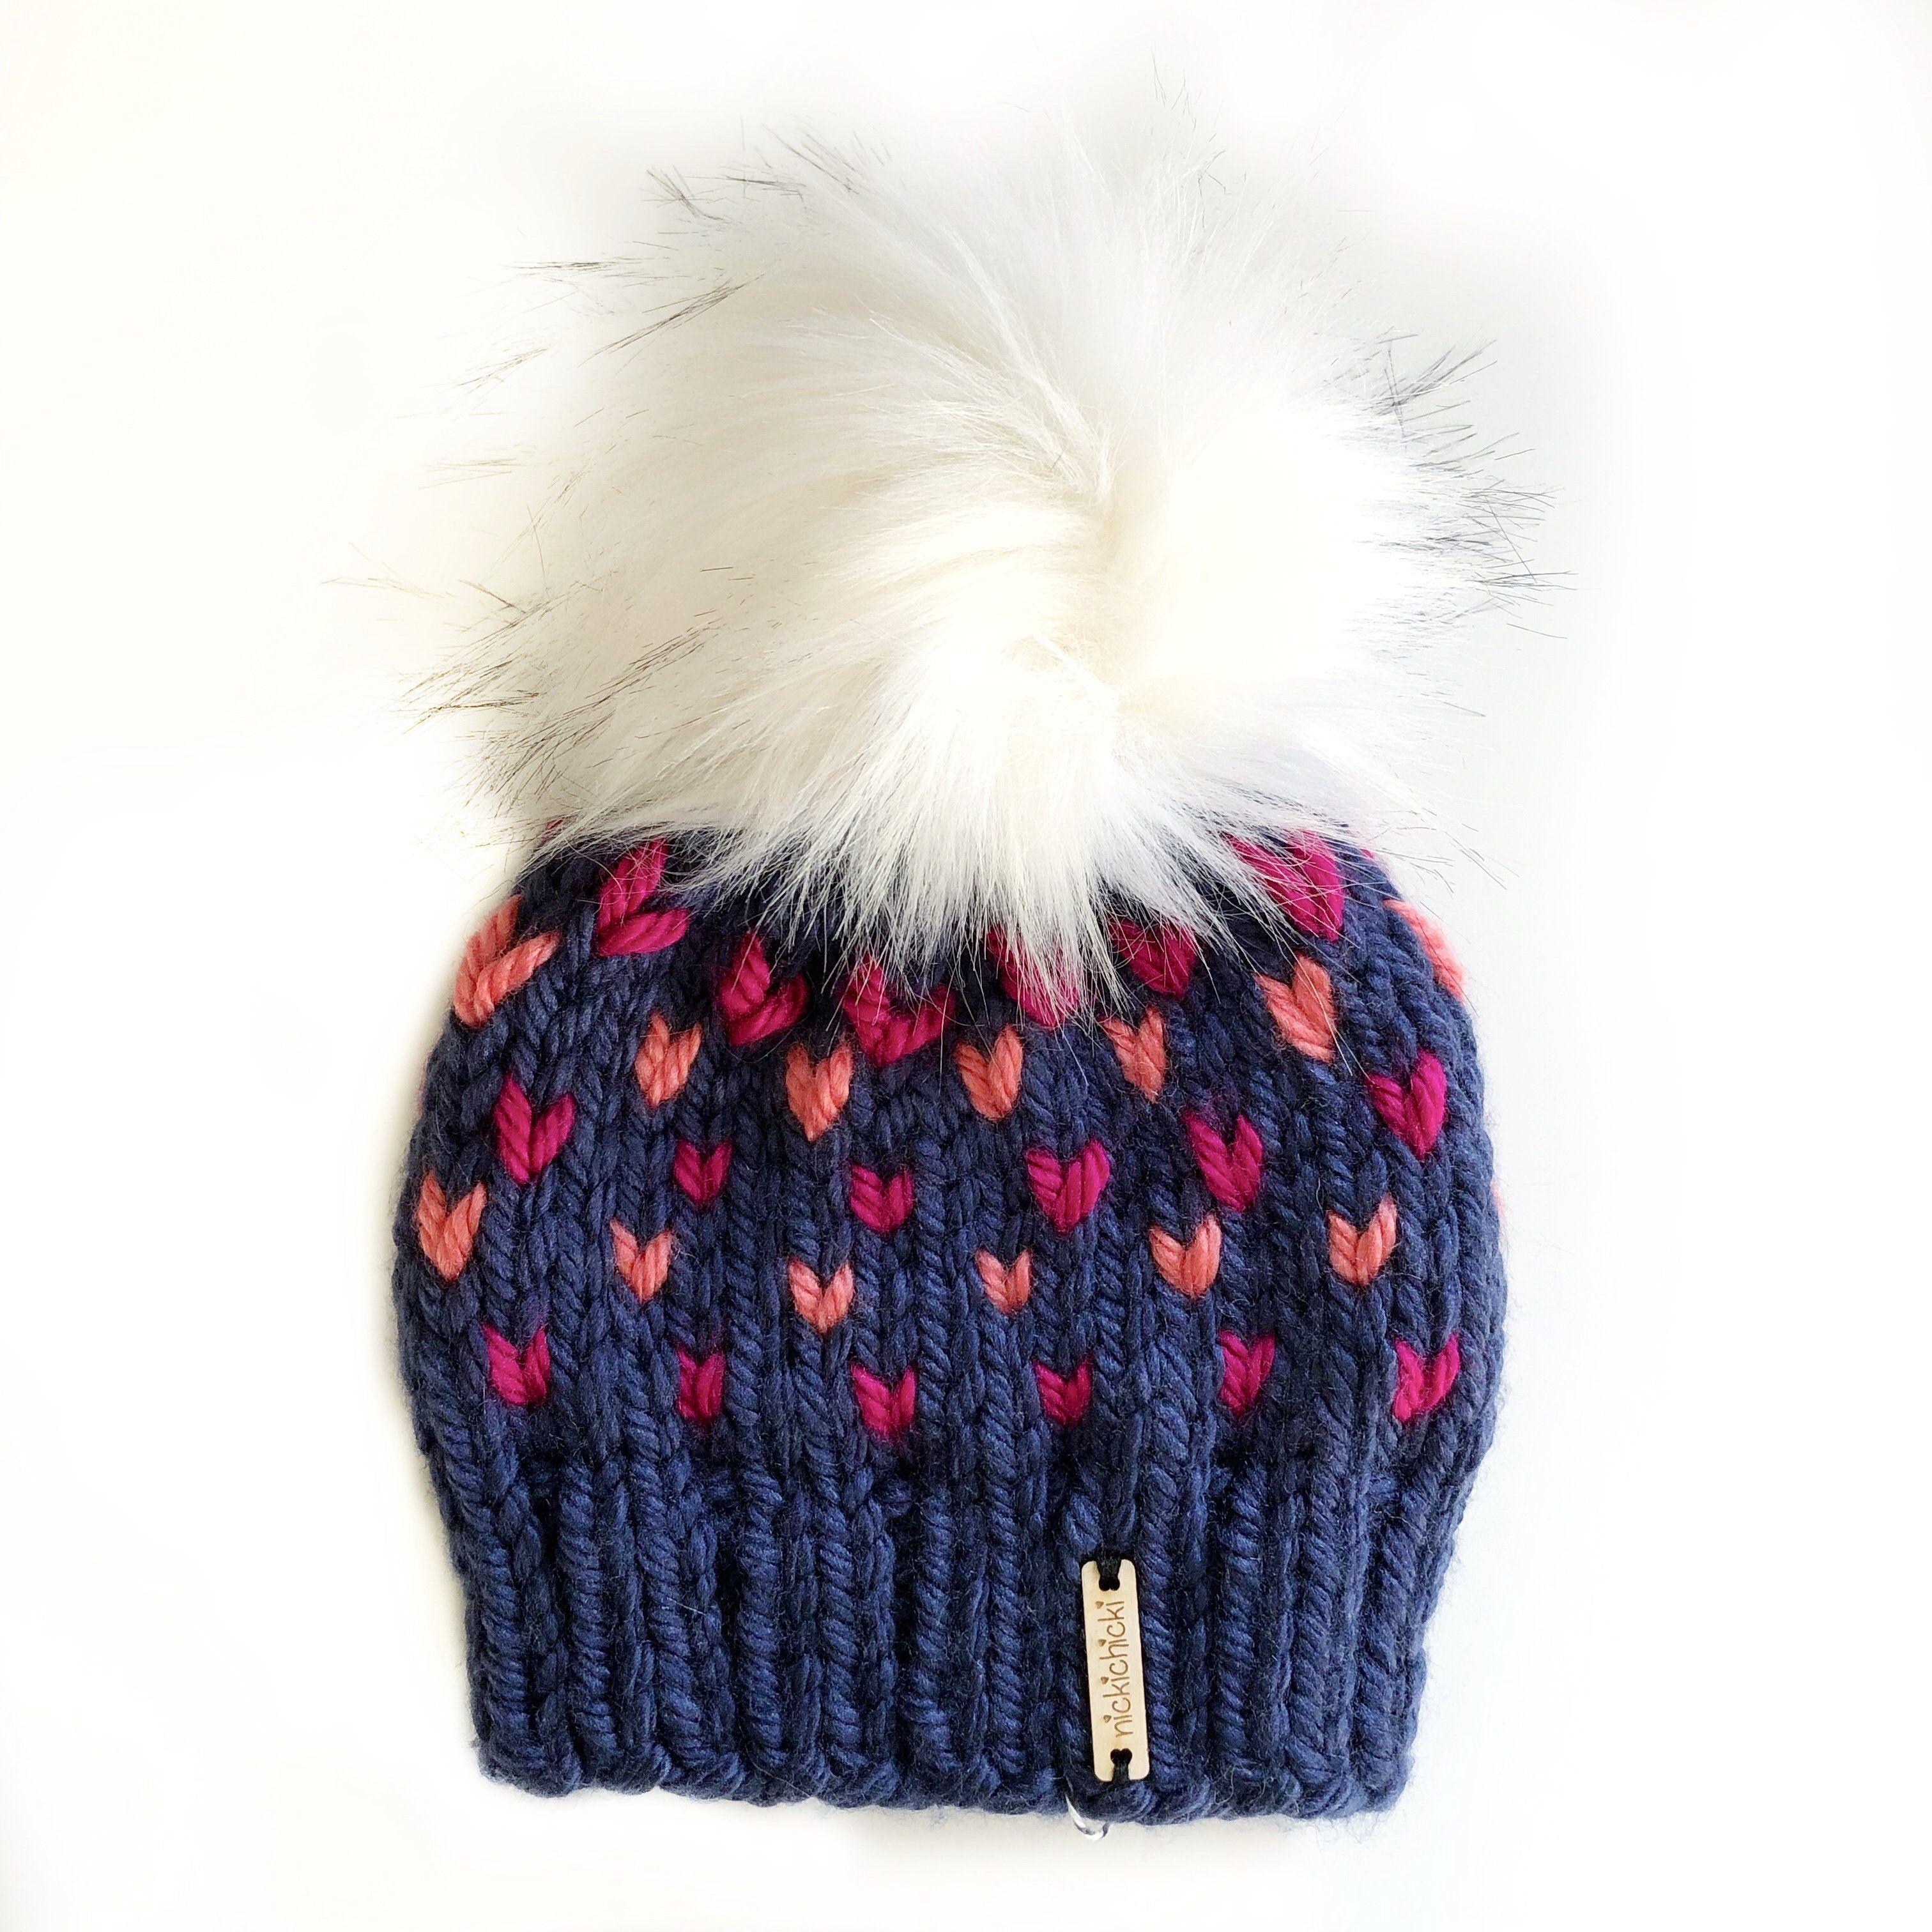 Tiny Hearts Faux Fur Pom-Pom Beanie in A Class Act (wool free ... 15799f76bb7